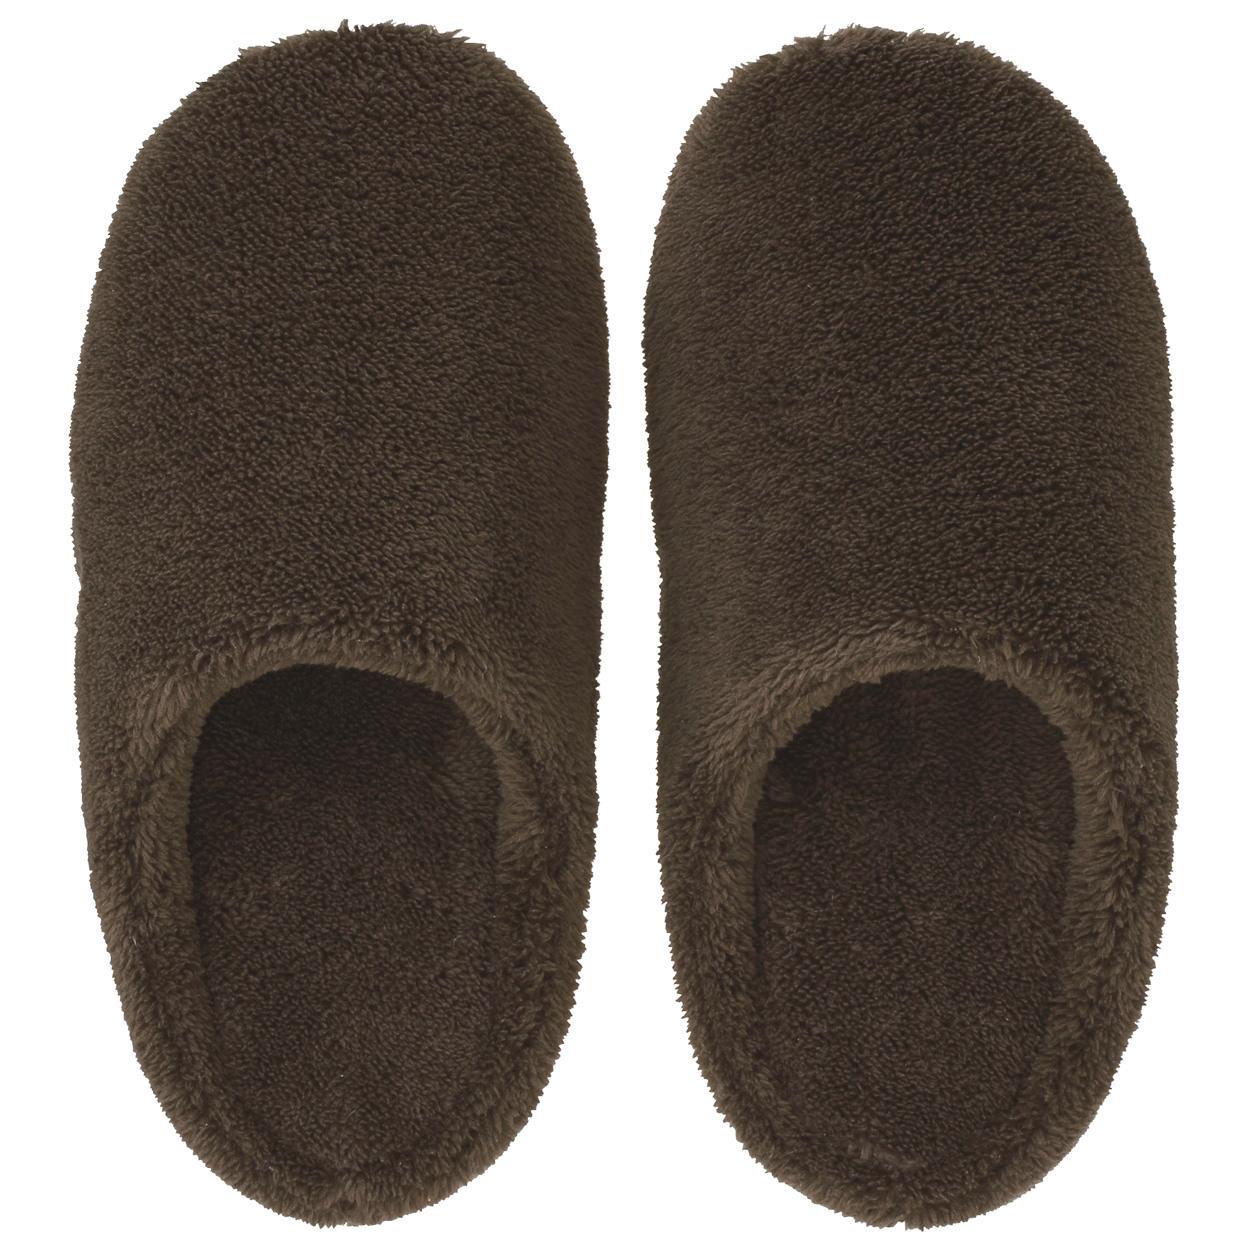 Micro Fiber Insole Cushion Slippers